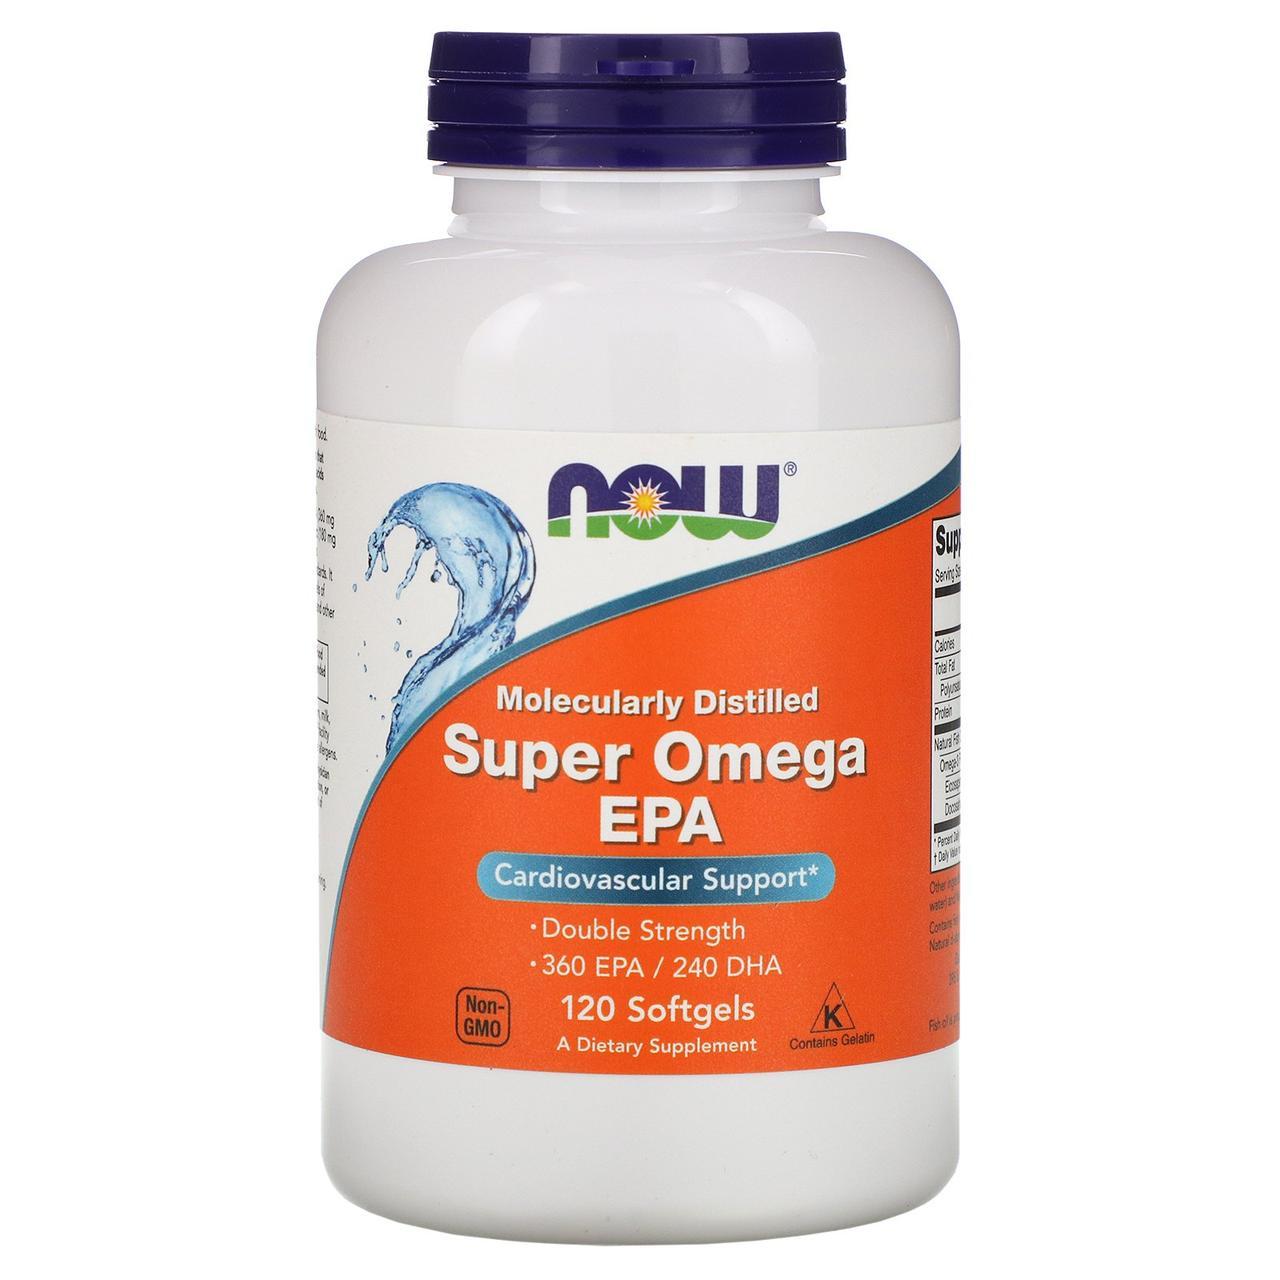 Супер Омега EPA для сердца, молекулярно дистиллирован,  Super Omega EPA, Now Foods, 120 капсул